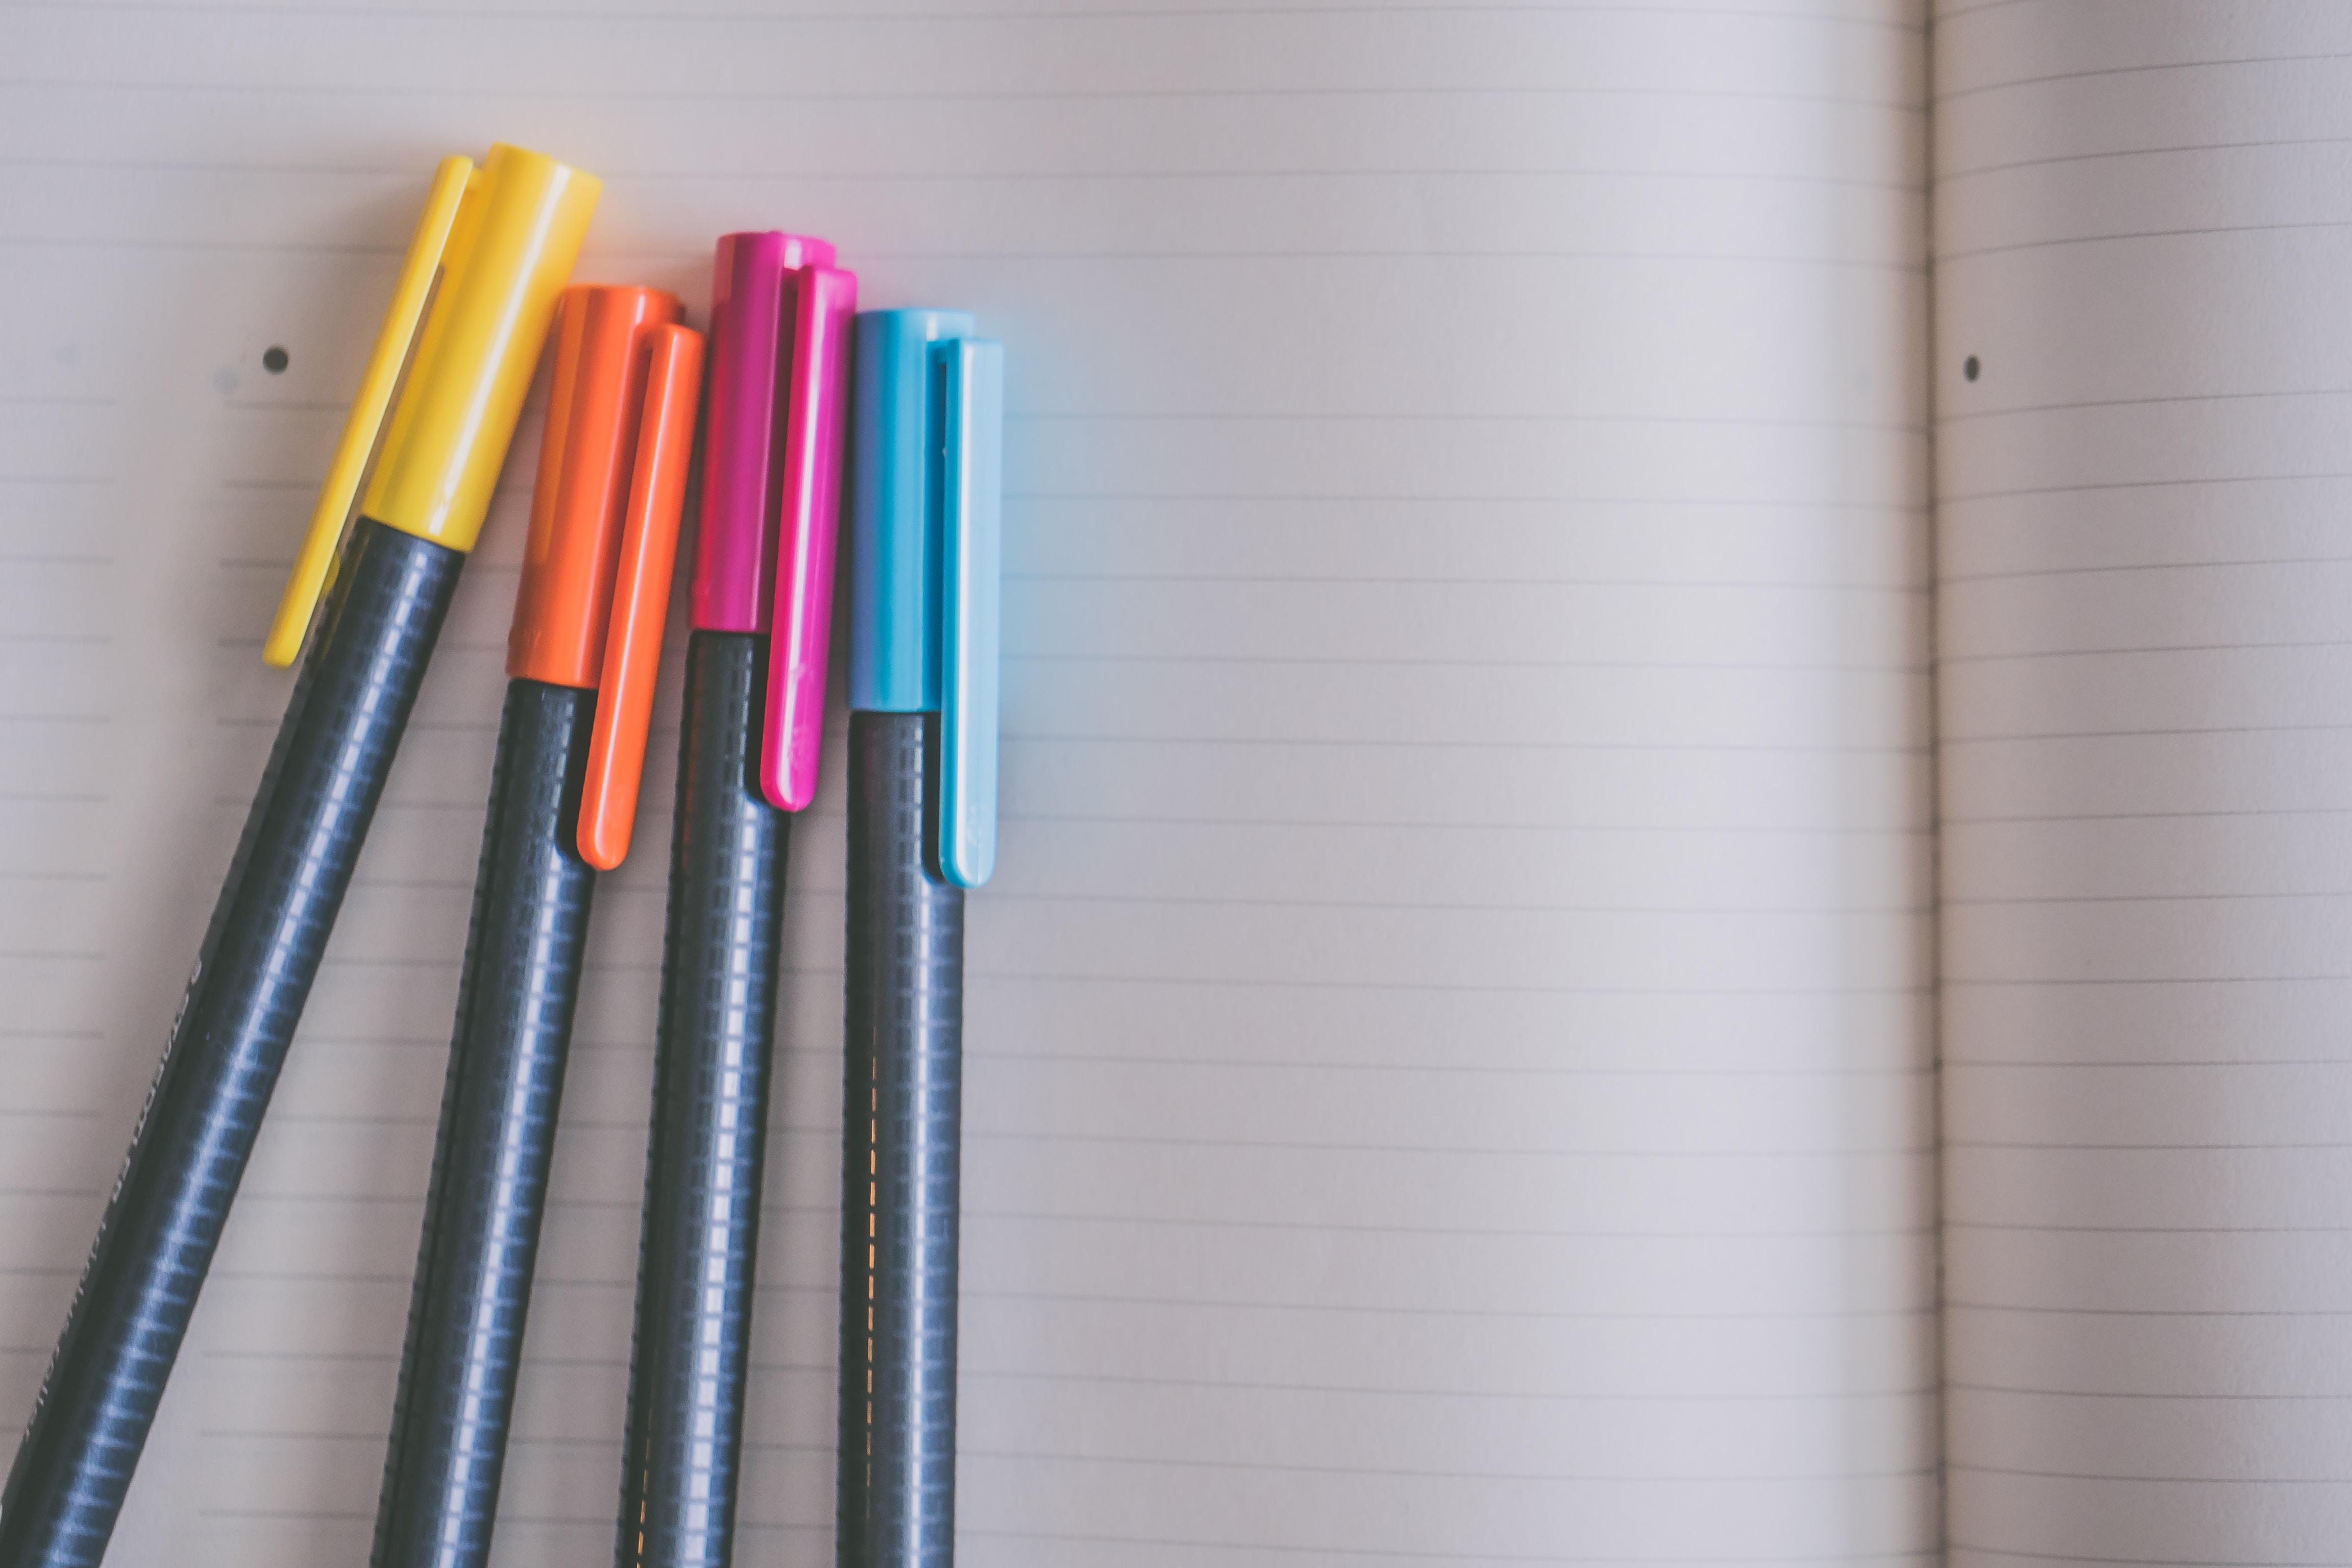 four pens on line paper